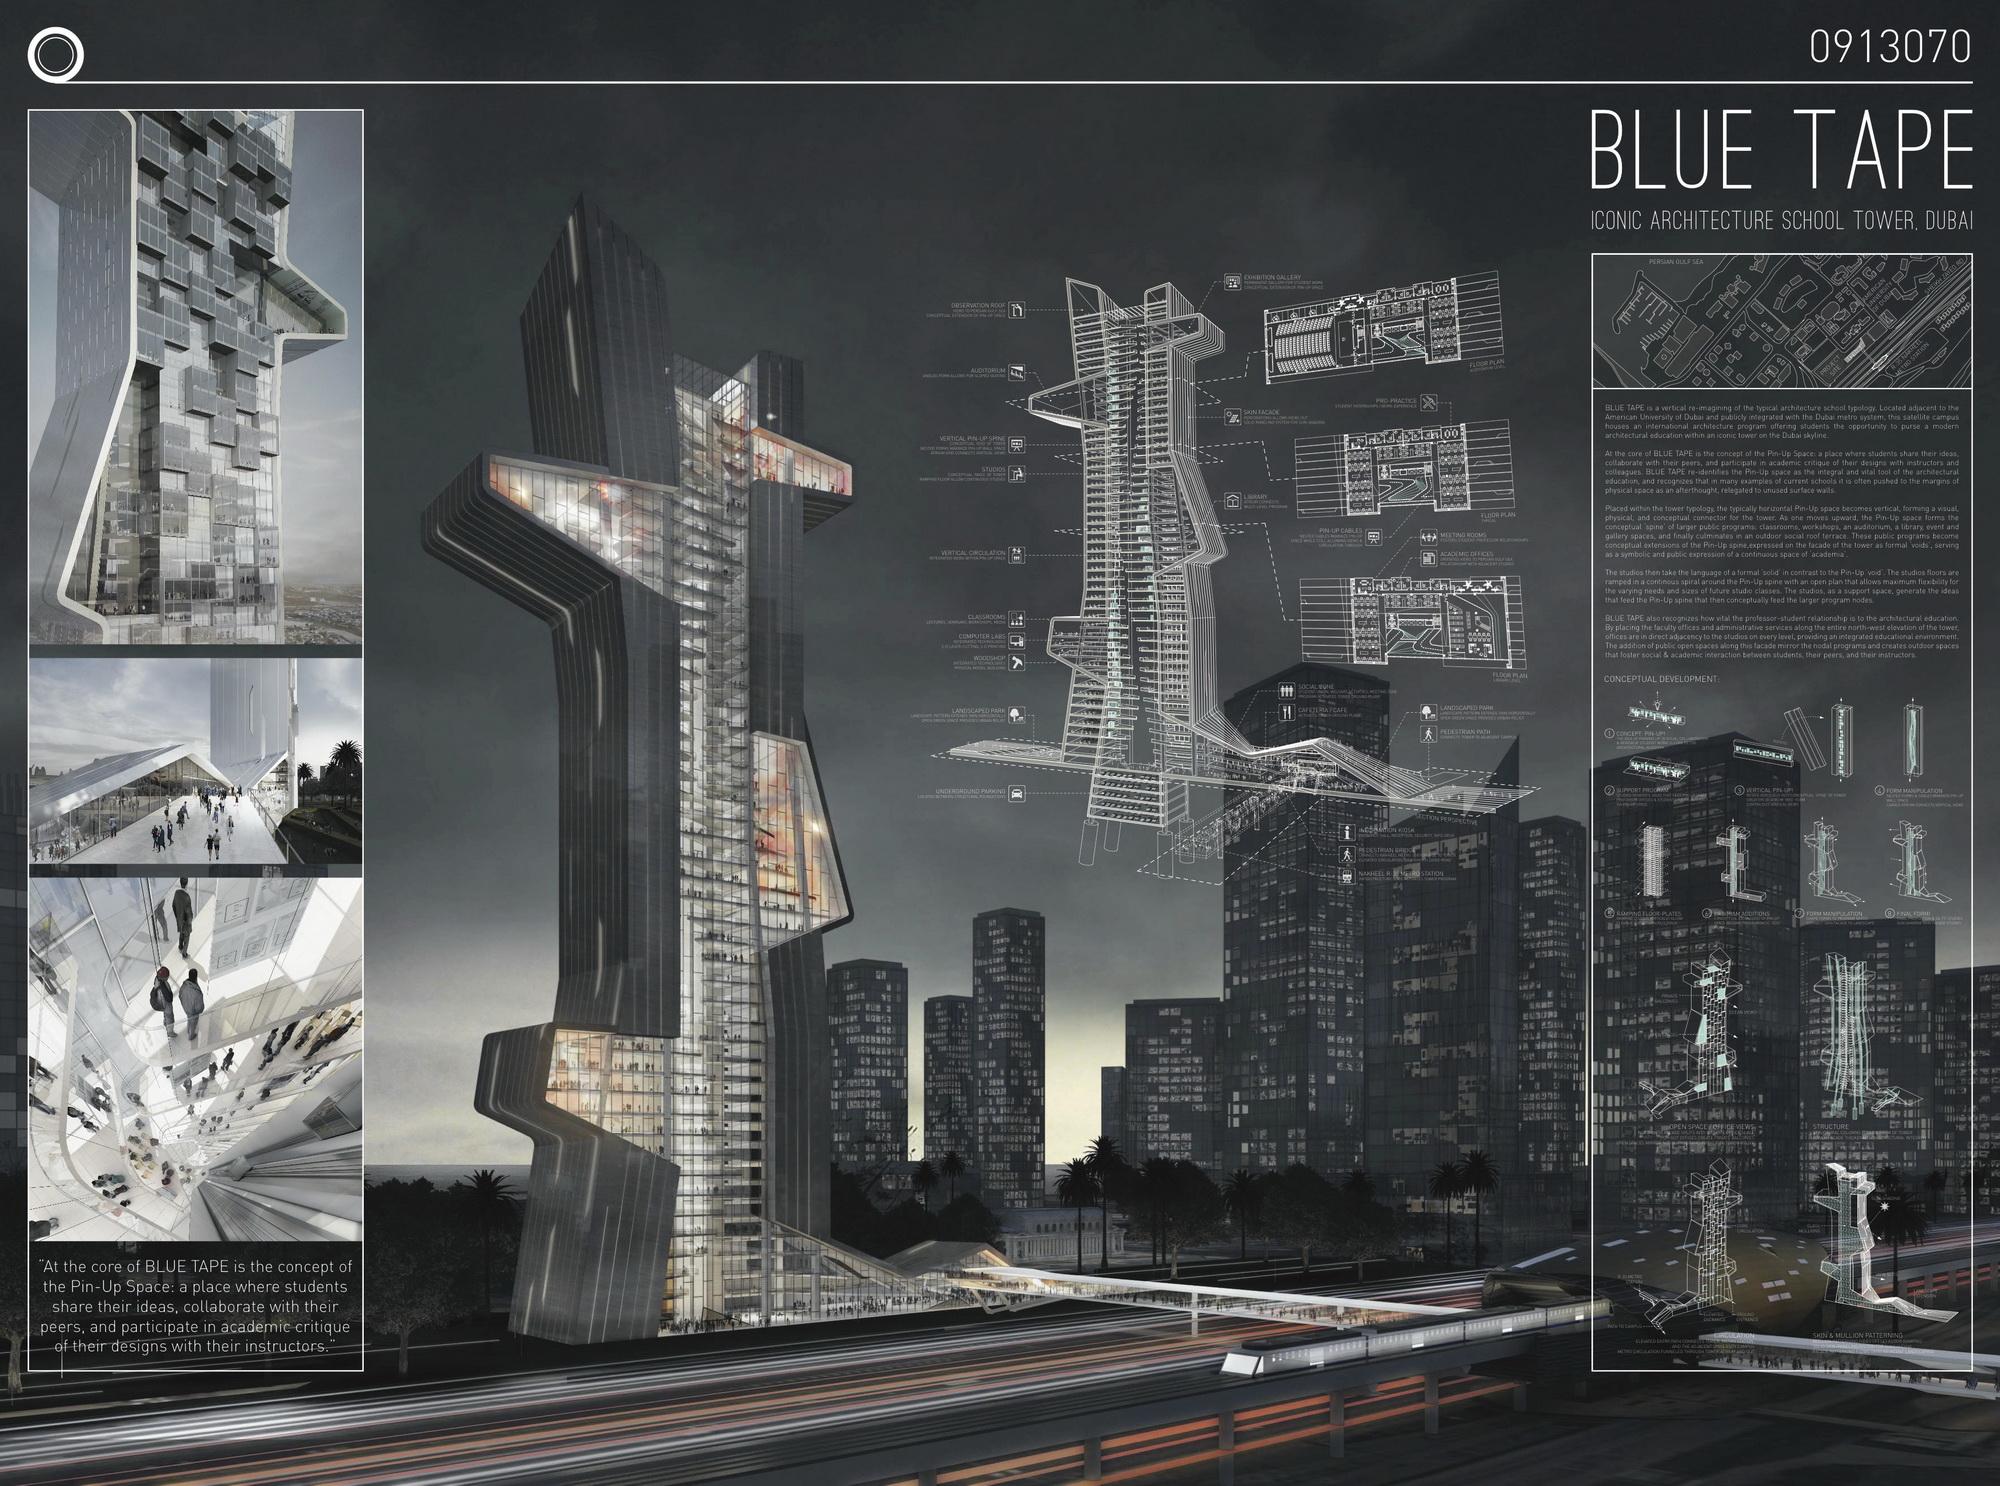 BLUE TAPE DUBAI09